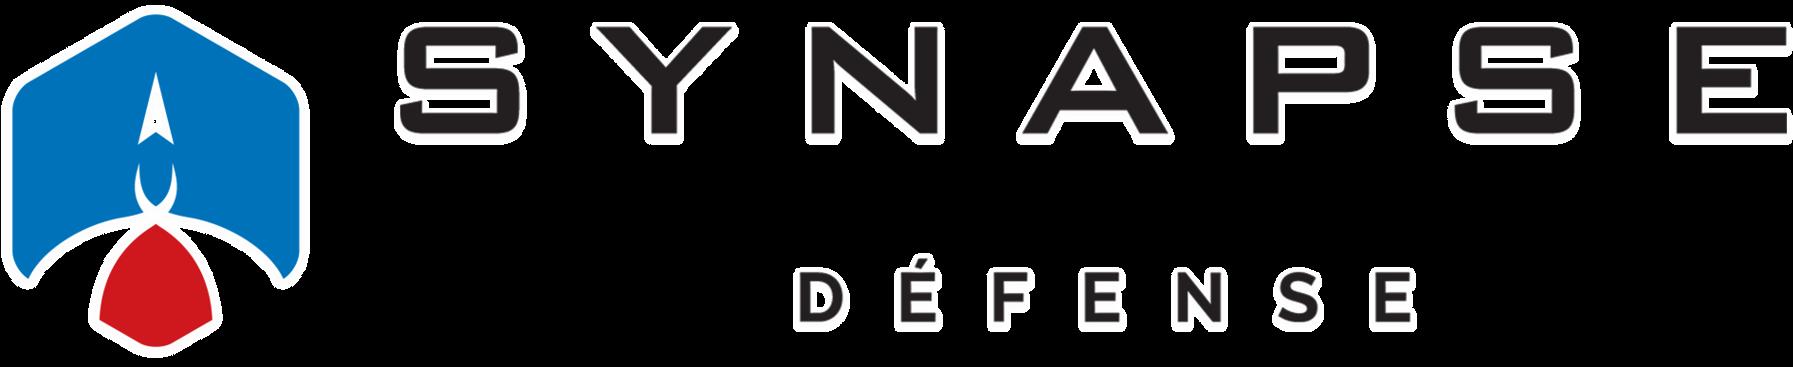 SYNAPSE DEFENSE